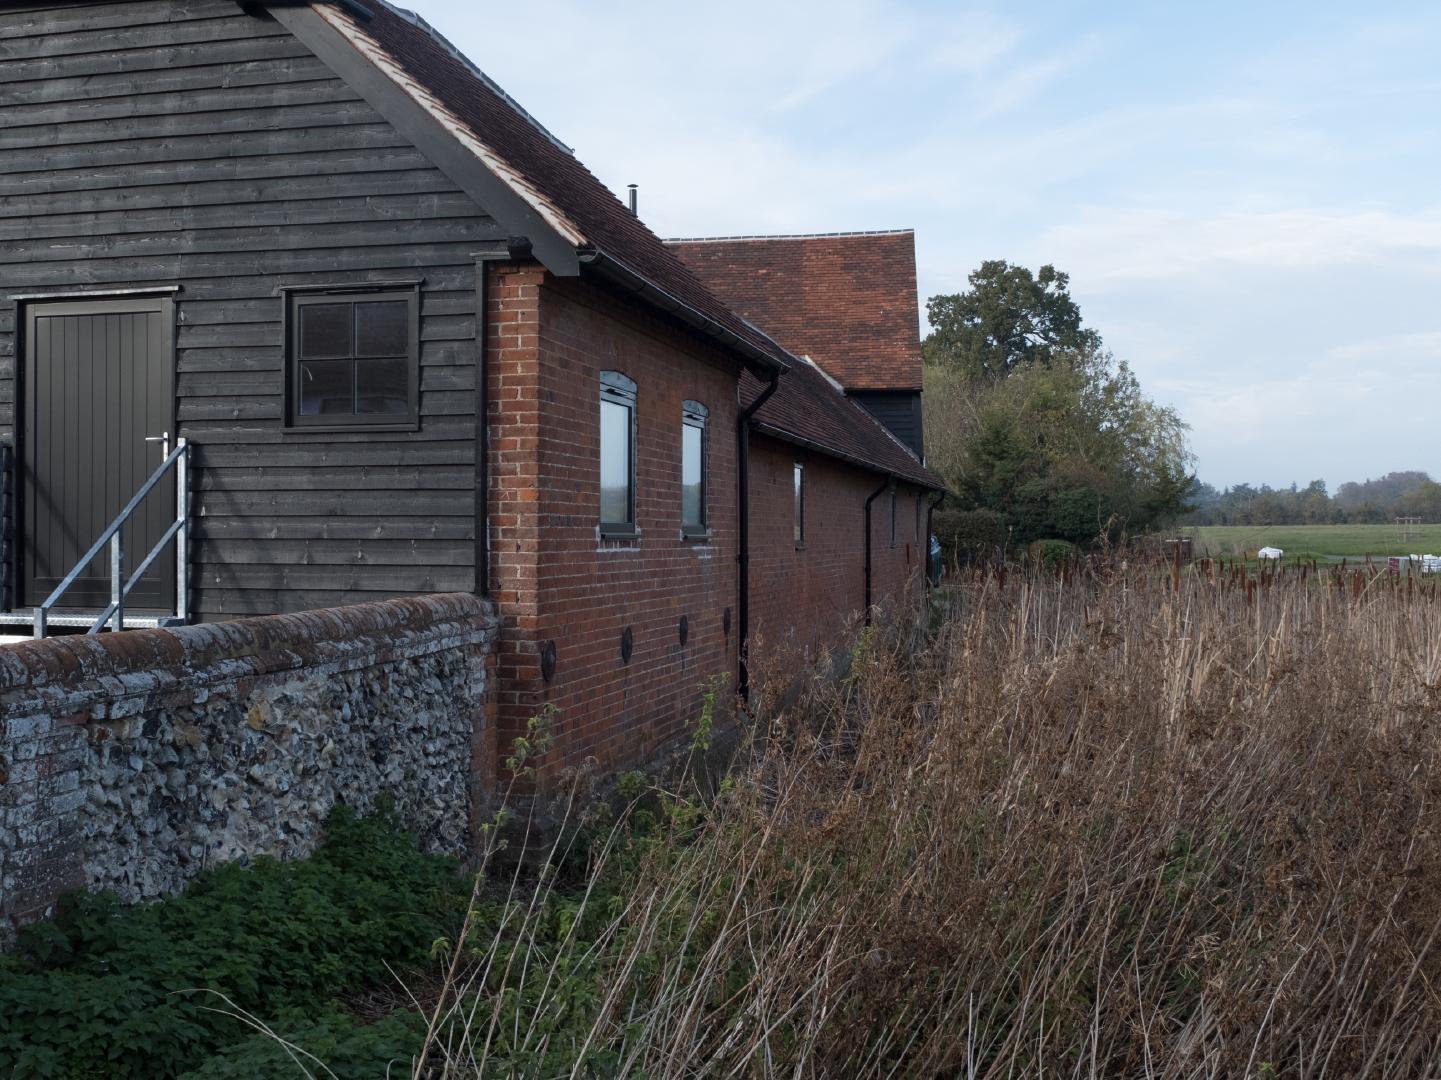 Woodside Farm Barns - Reflecting the environment